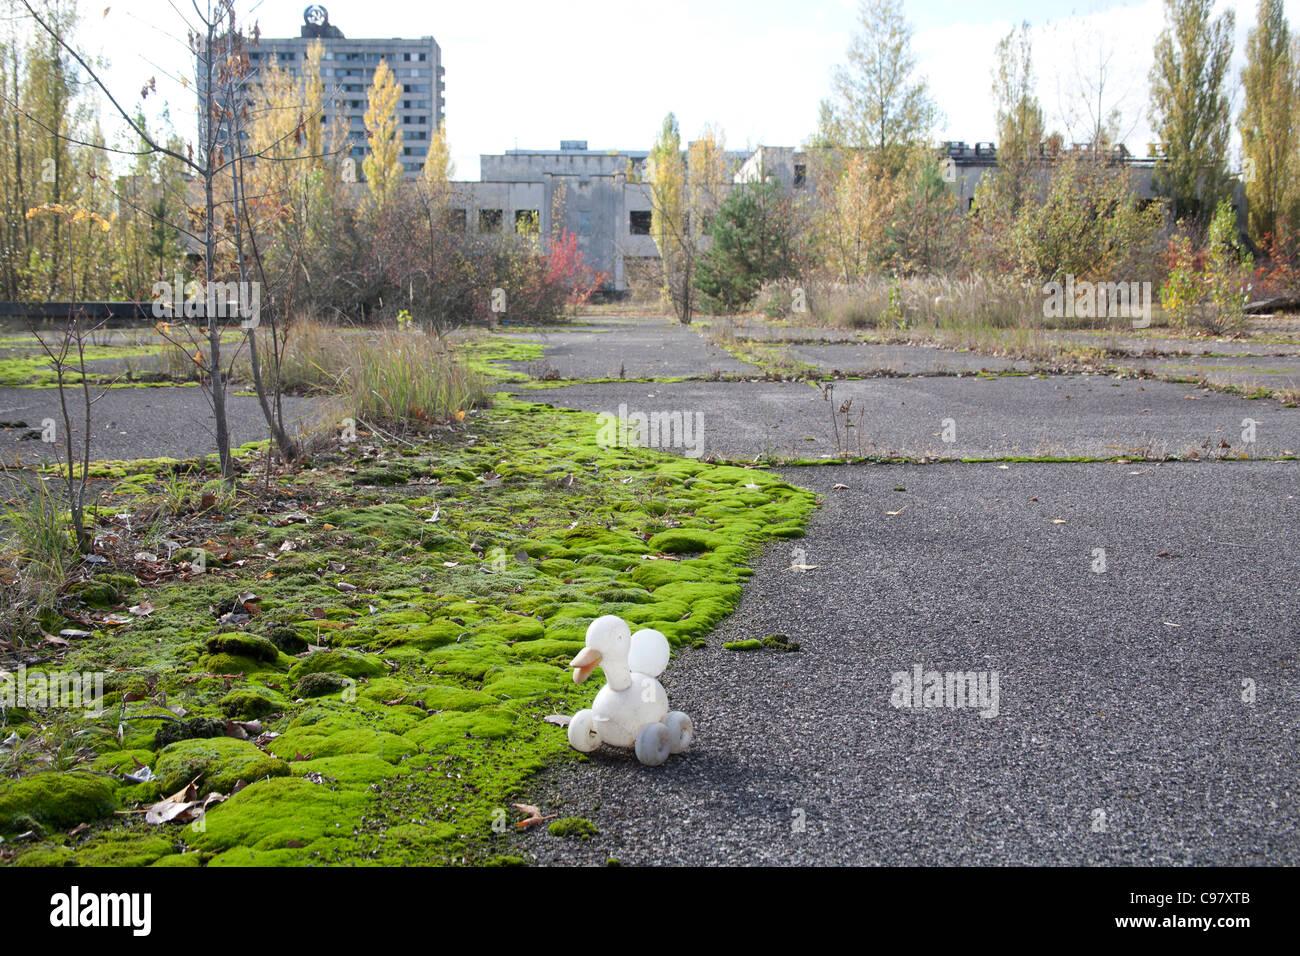 Childs toy duck abandoned on Lenin Square, Pripyat Chernobyl exclusion zone Ukraine - Stock Image